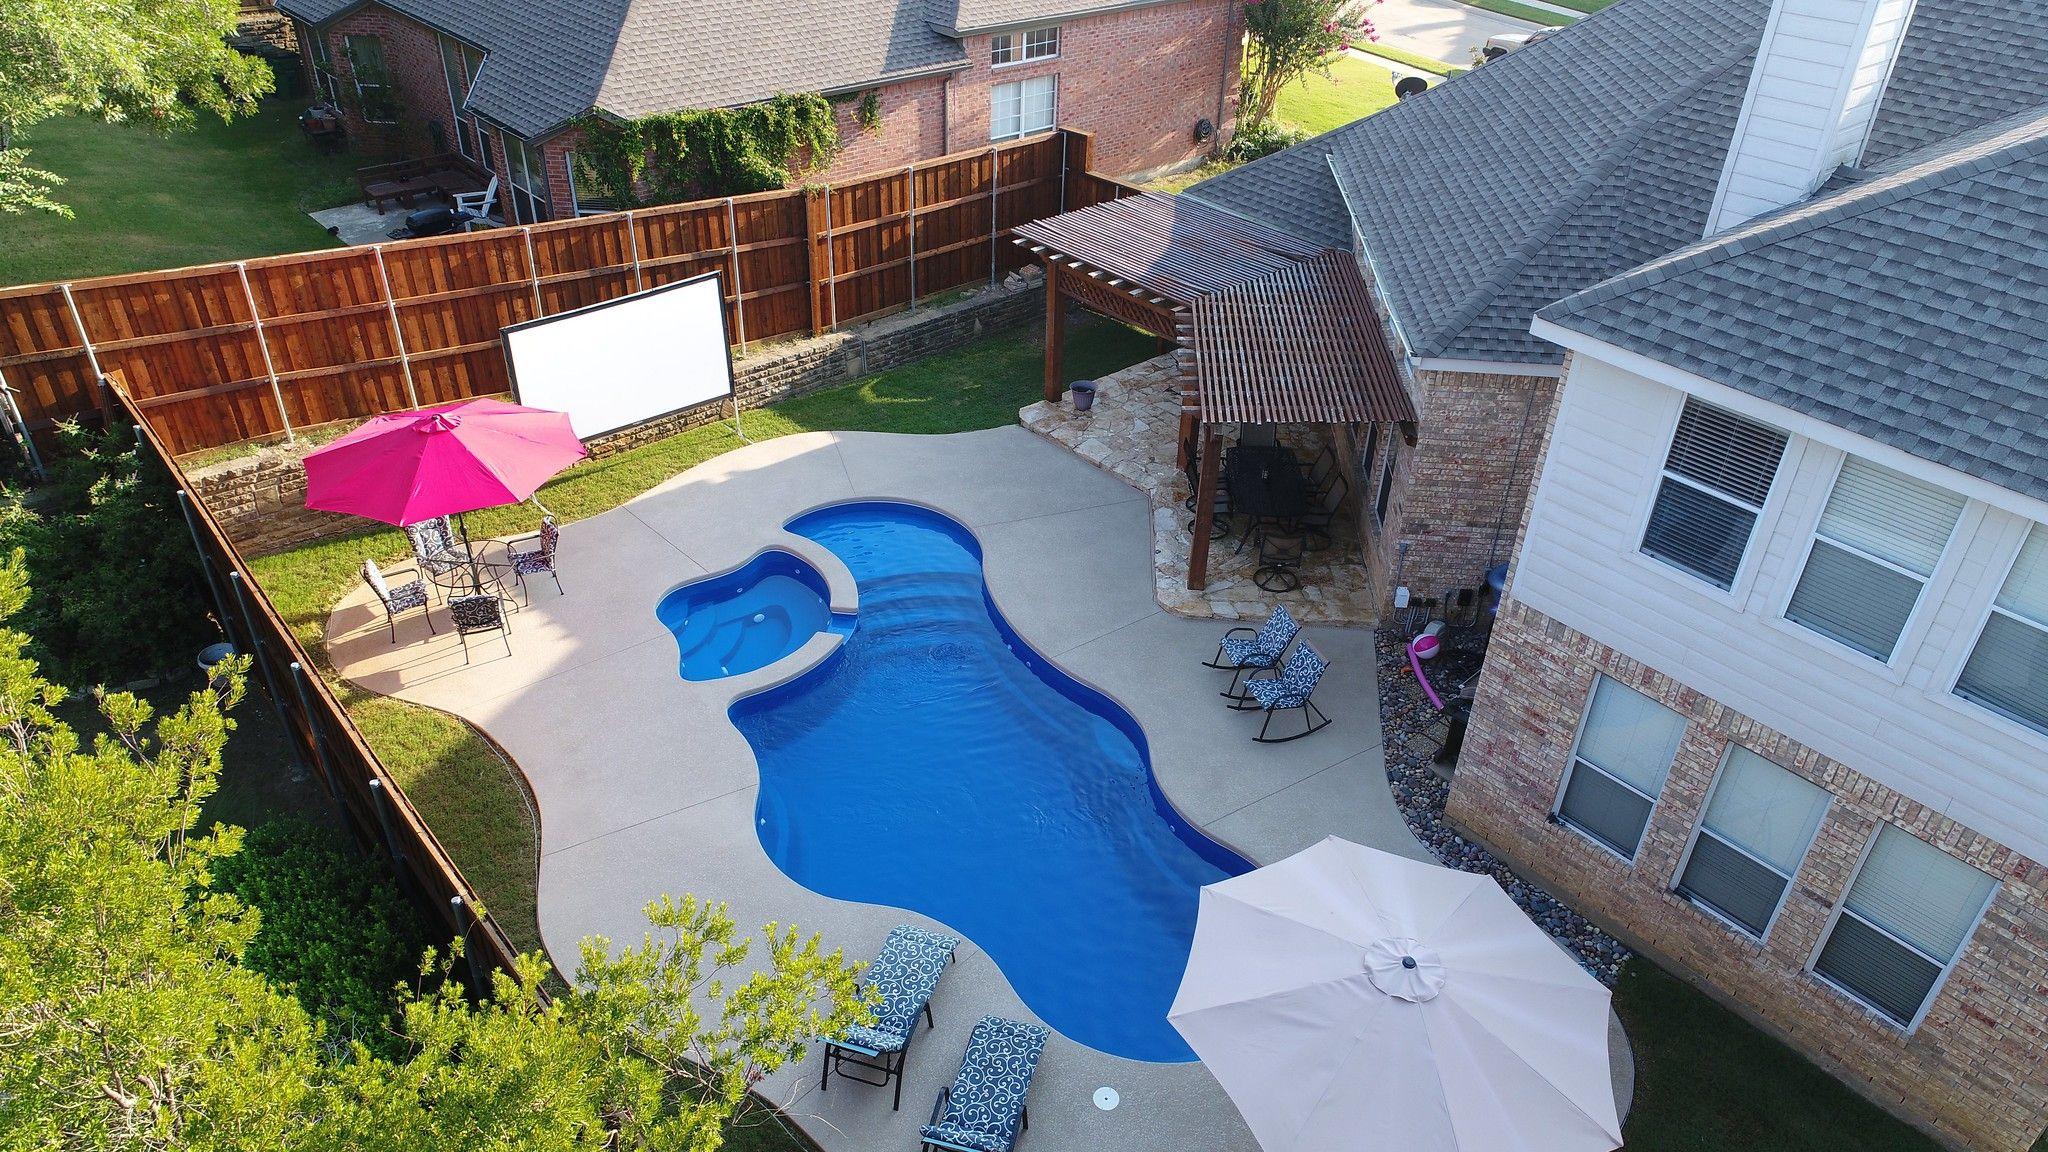 Cancun Deluxe Pool Spa Combo From Aquamarine Pools Aquapools Com Spa Pool Swimming Pools Pool